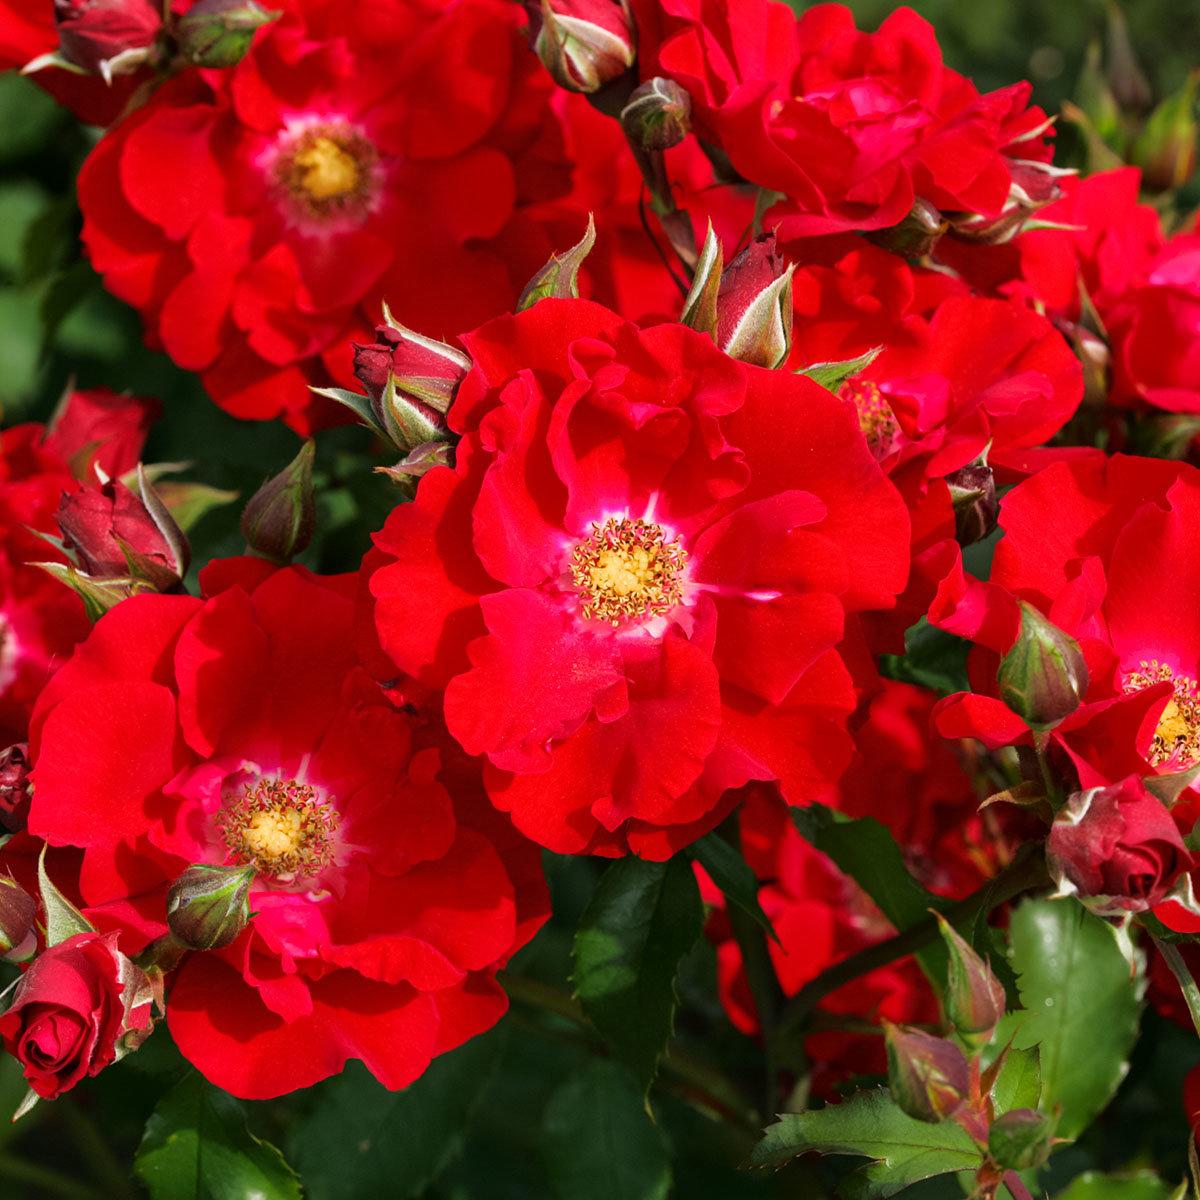 Rose Roter Korsar, im 5,5-Liter-Topf | #2